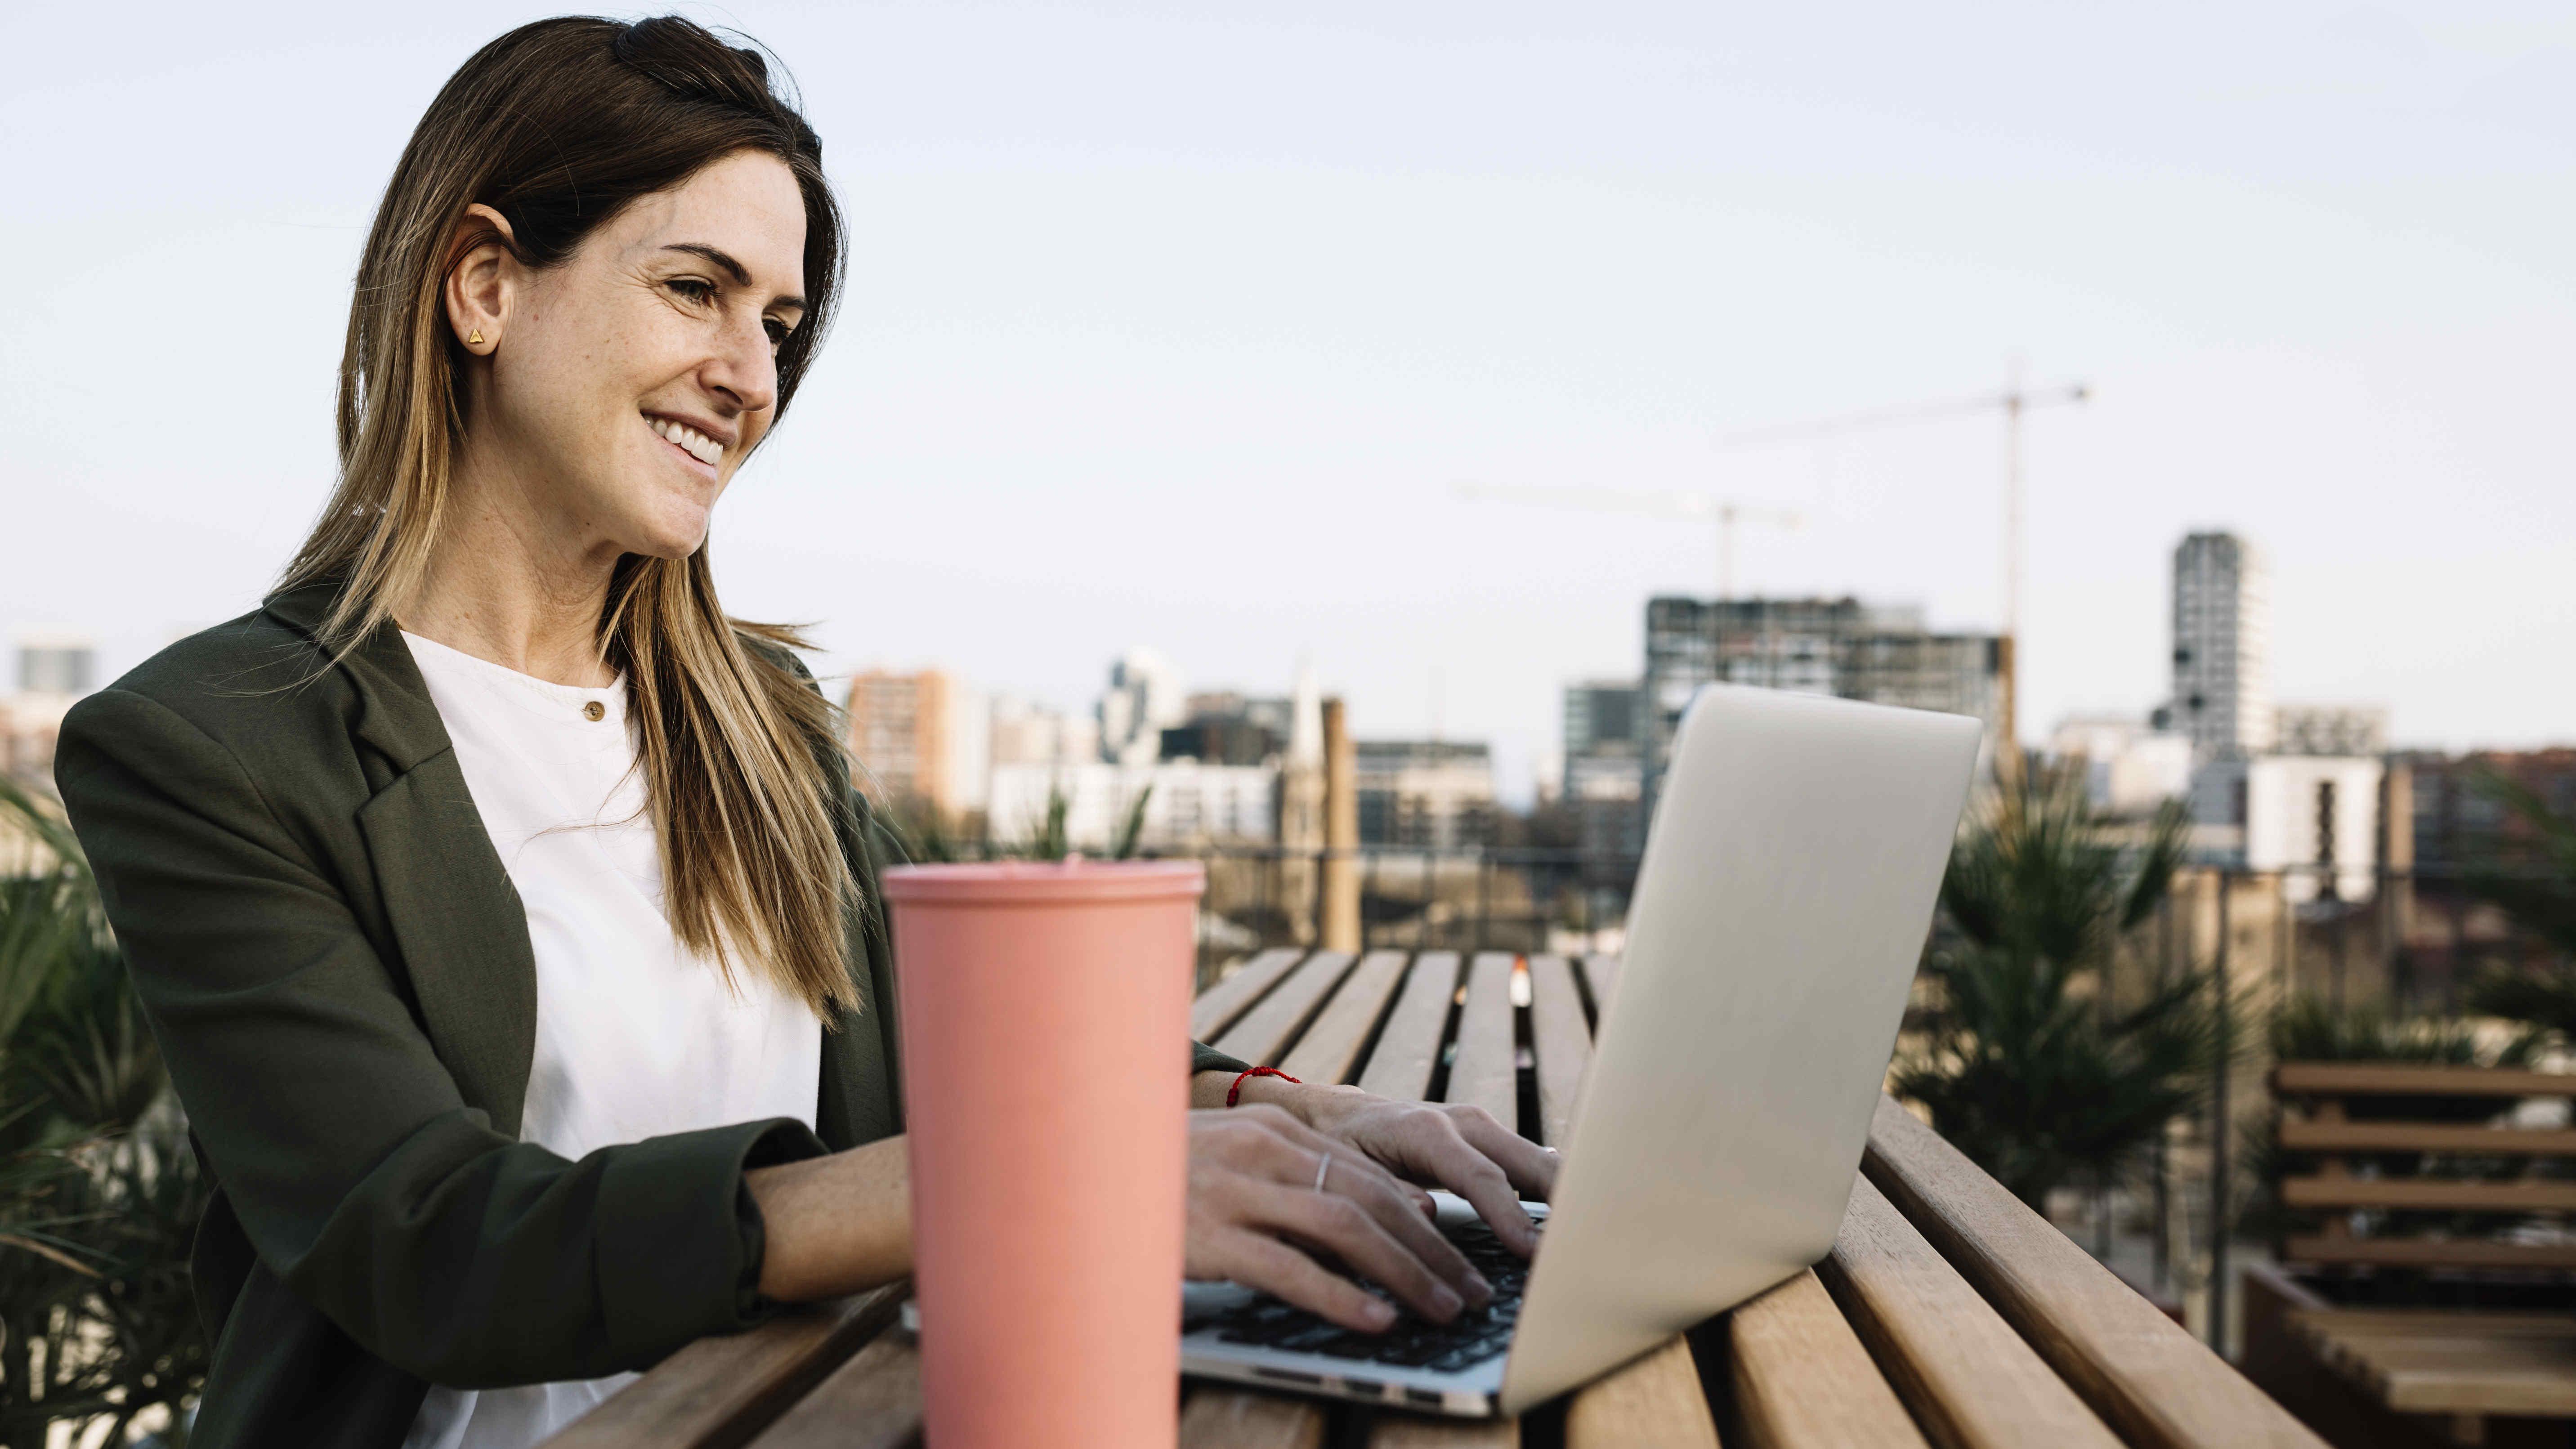 Business, Laptop, Notebooks, IT & Informatik, Technologie Urheberrechte: Adobe Stock / Xavier Lorenzo